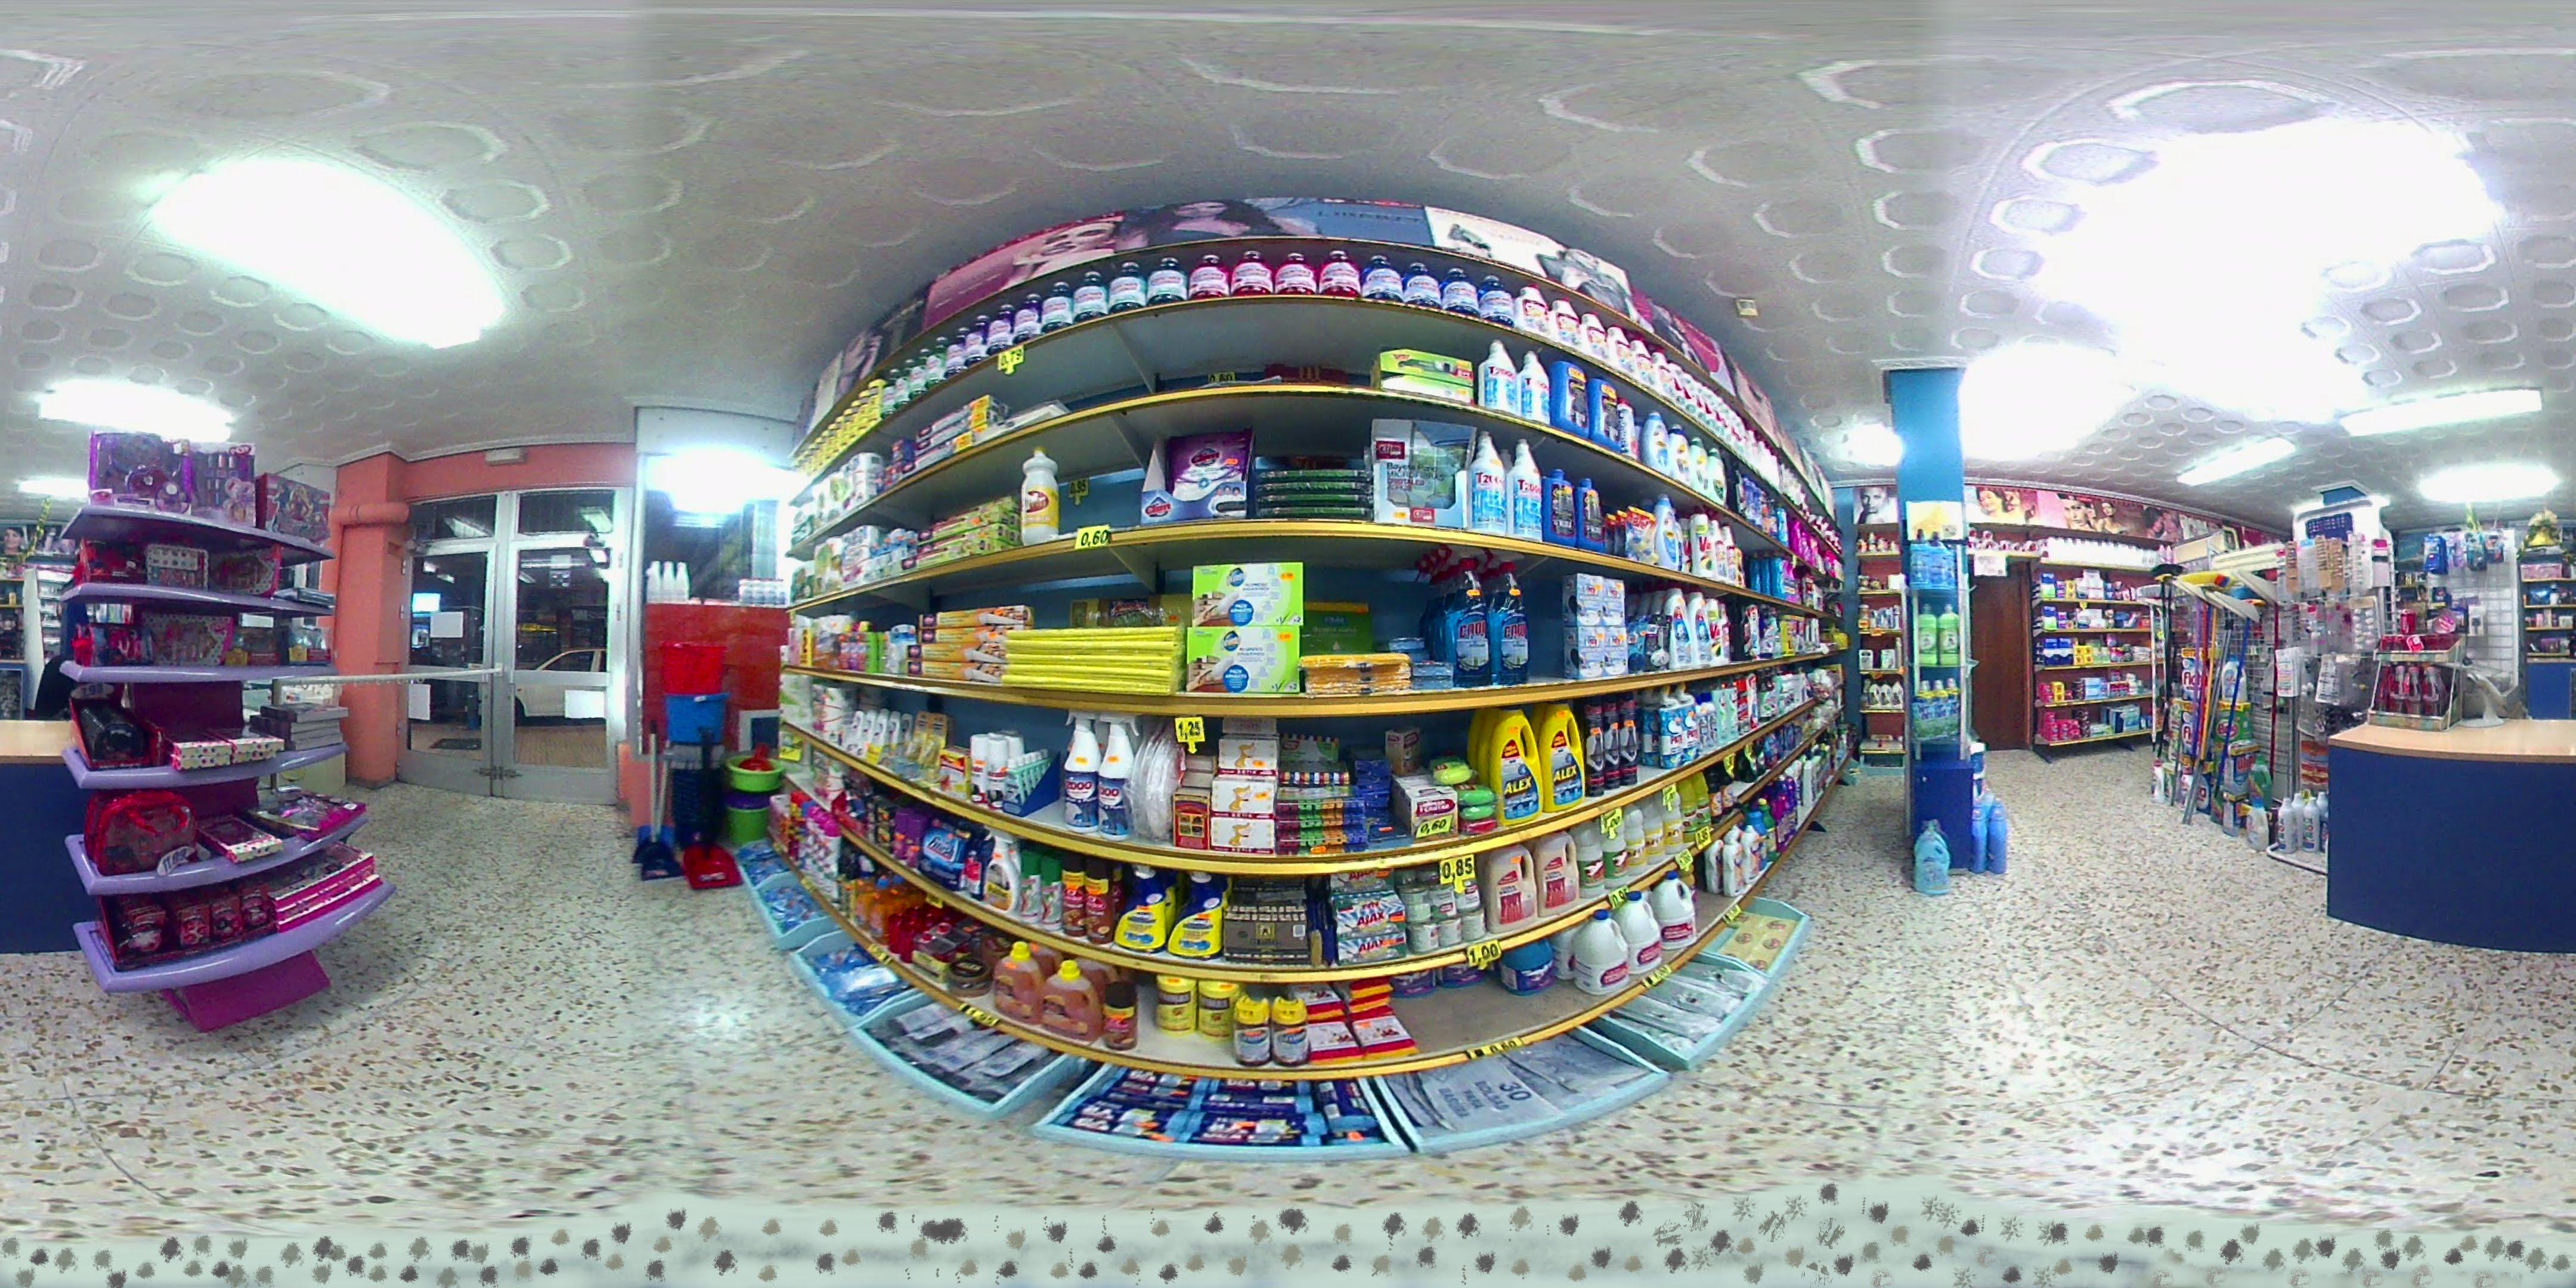 LOPEZ, PERFUMERÍA, DROGUERÍA, PINTURAS, COSMÉTICA